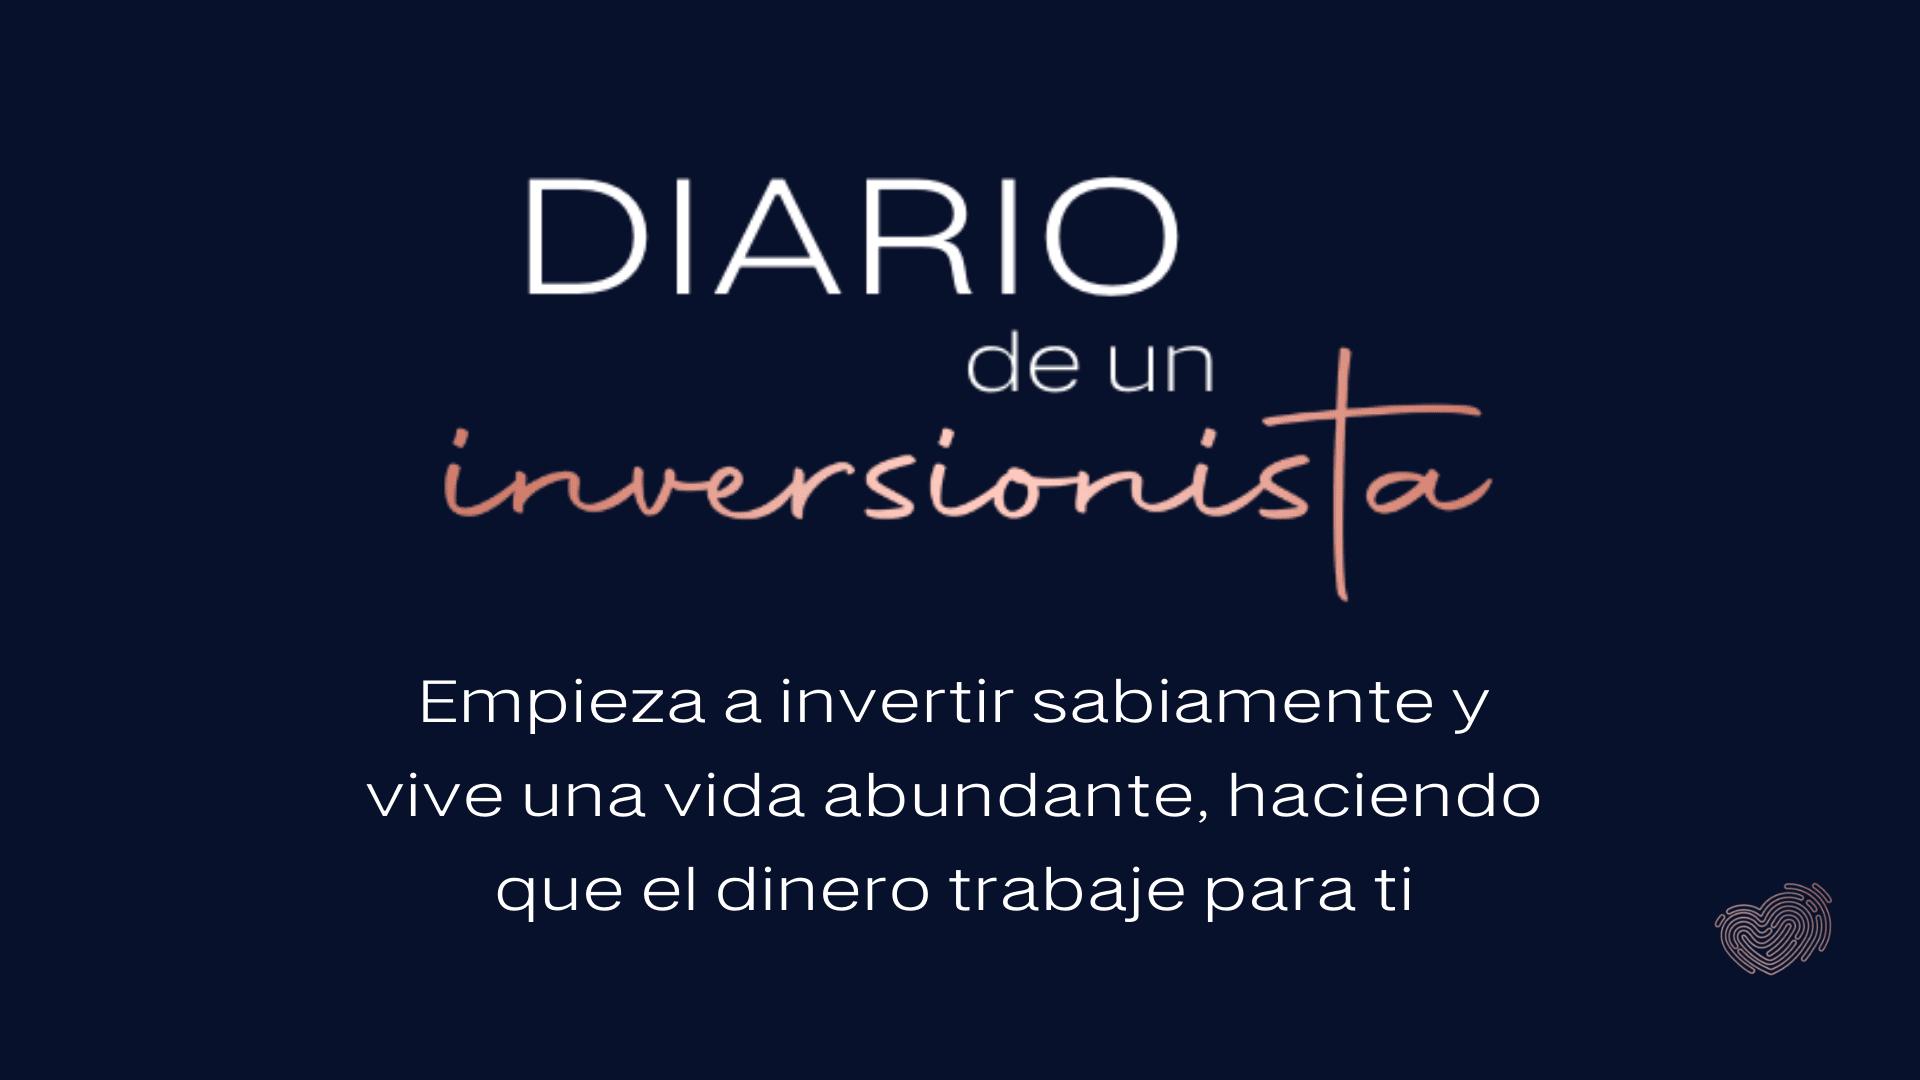 Diario de un inversionista